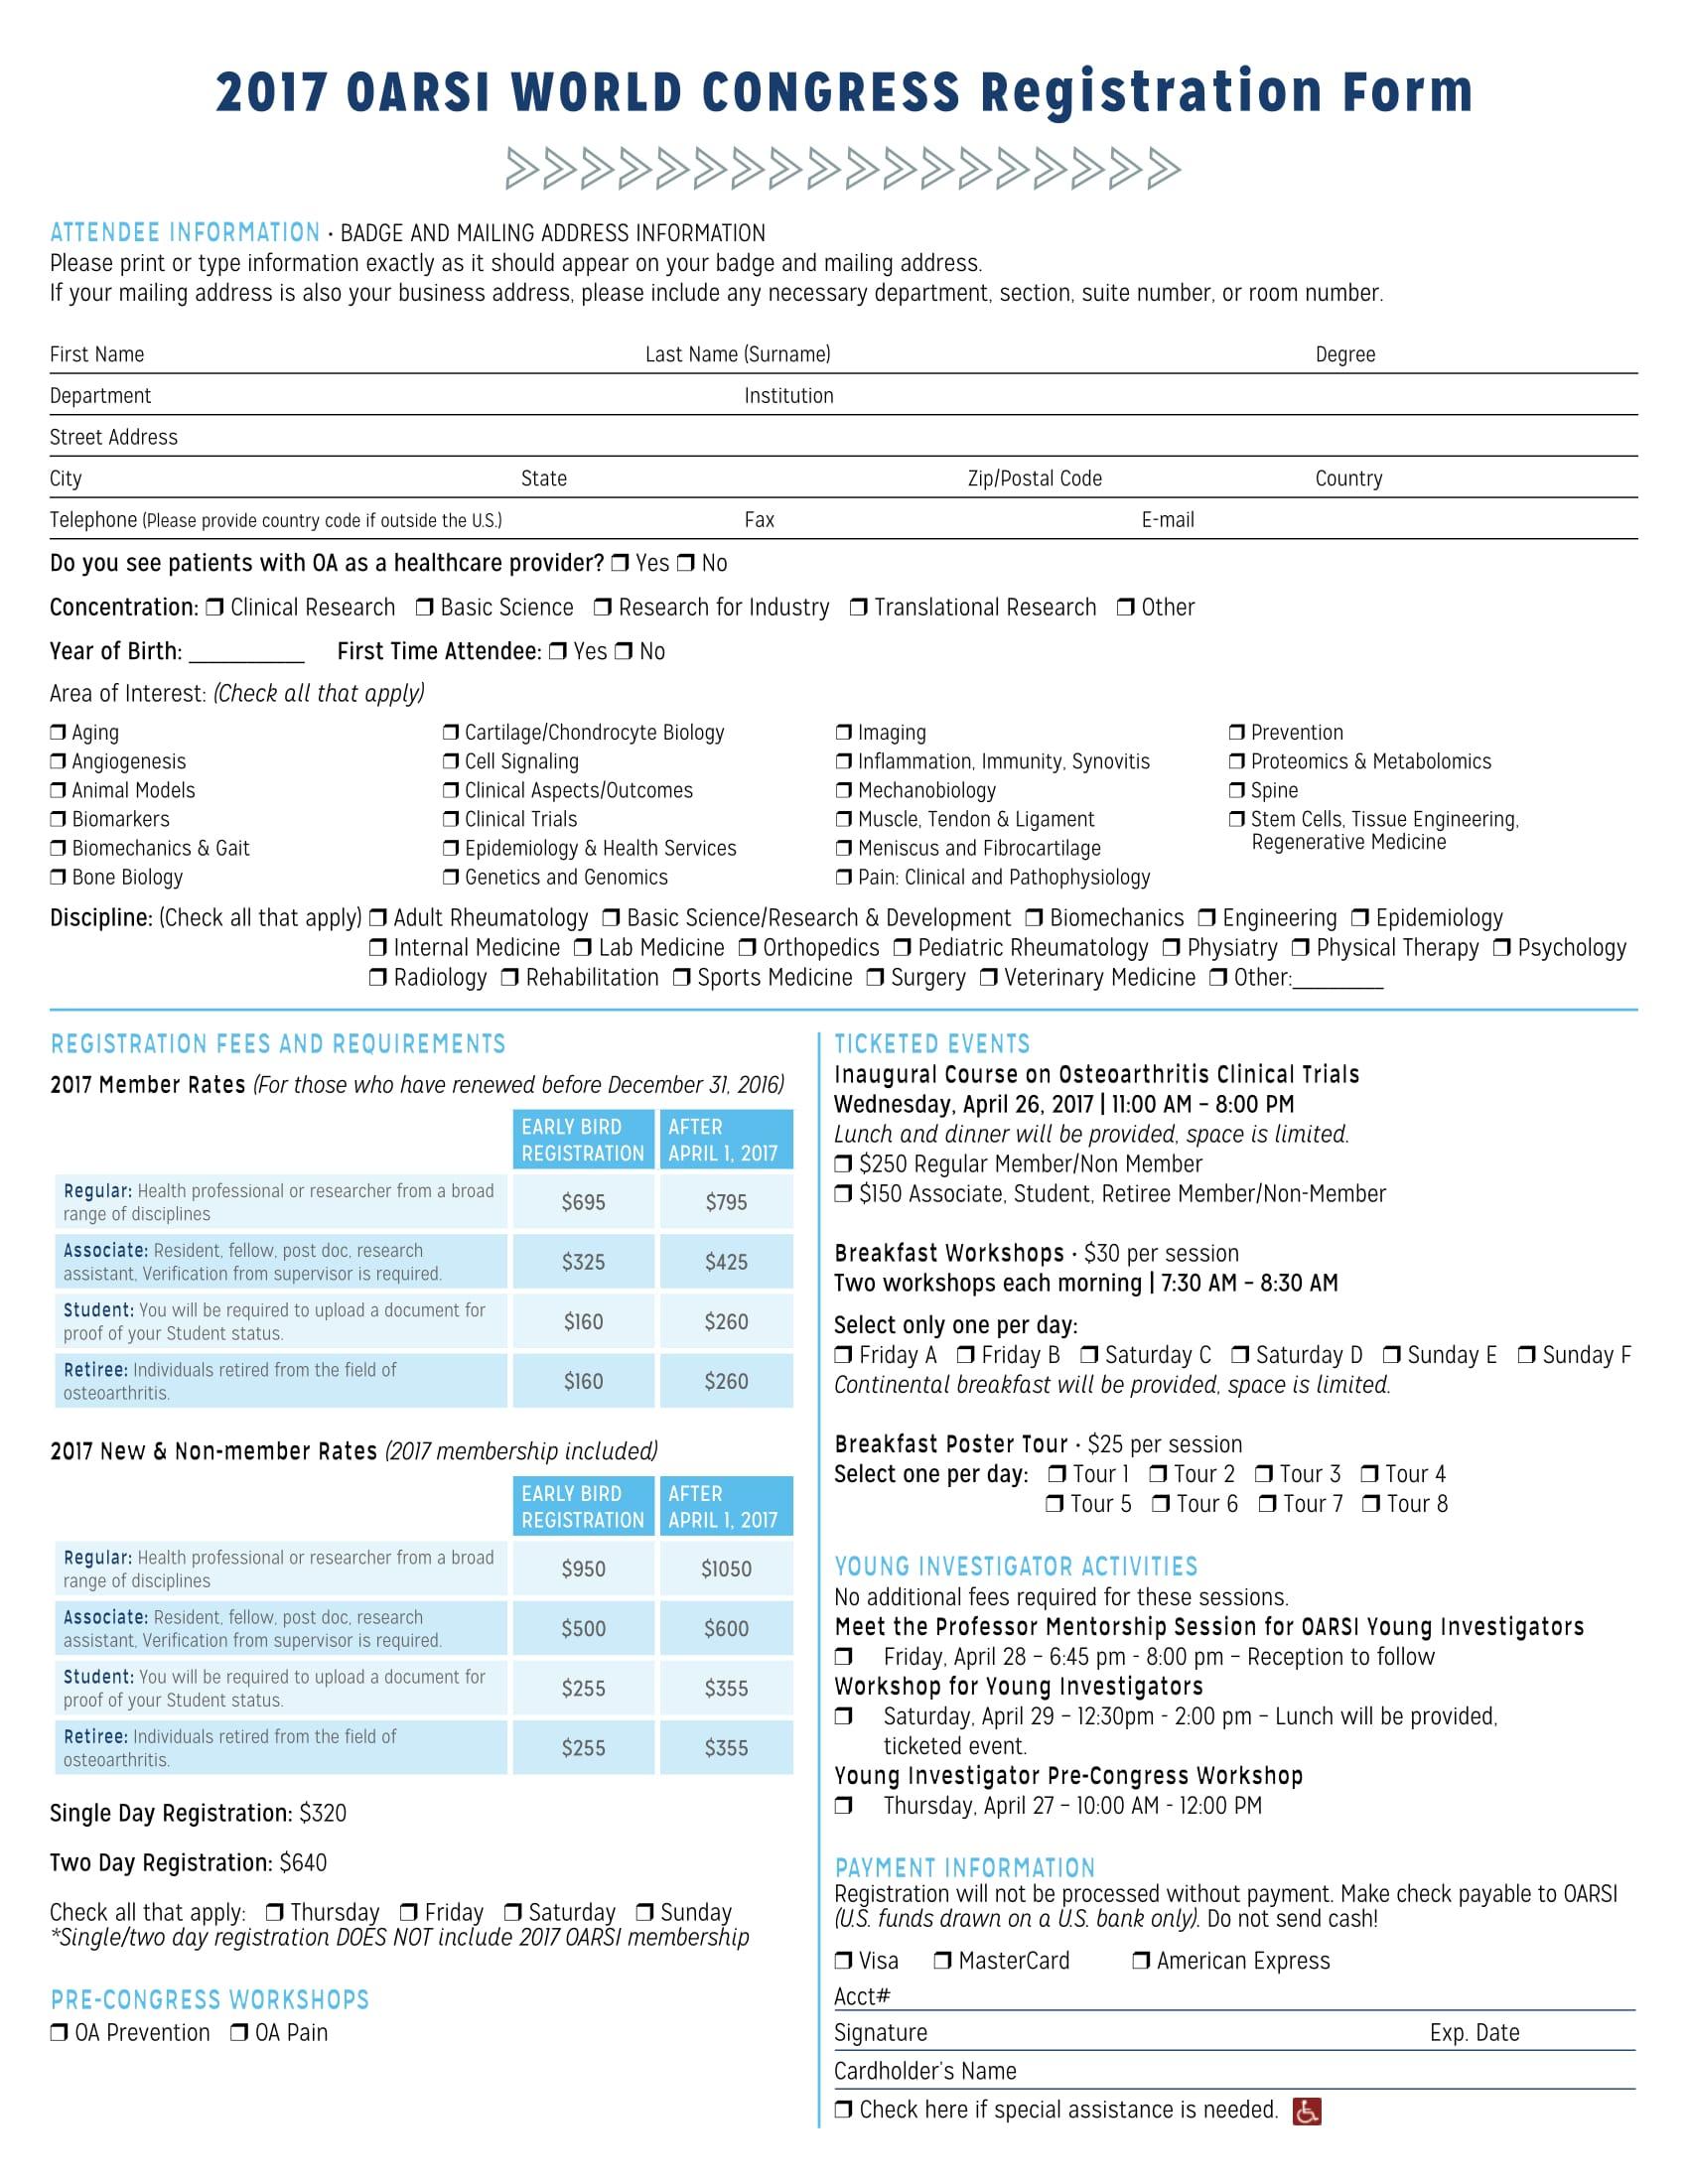 congress event registration form 1